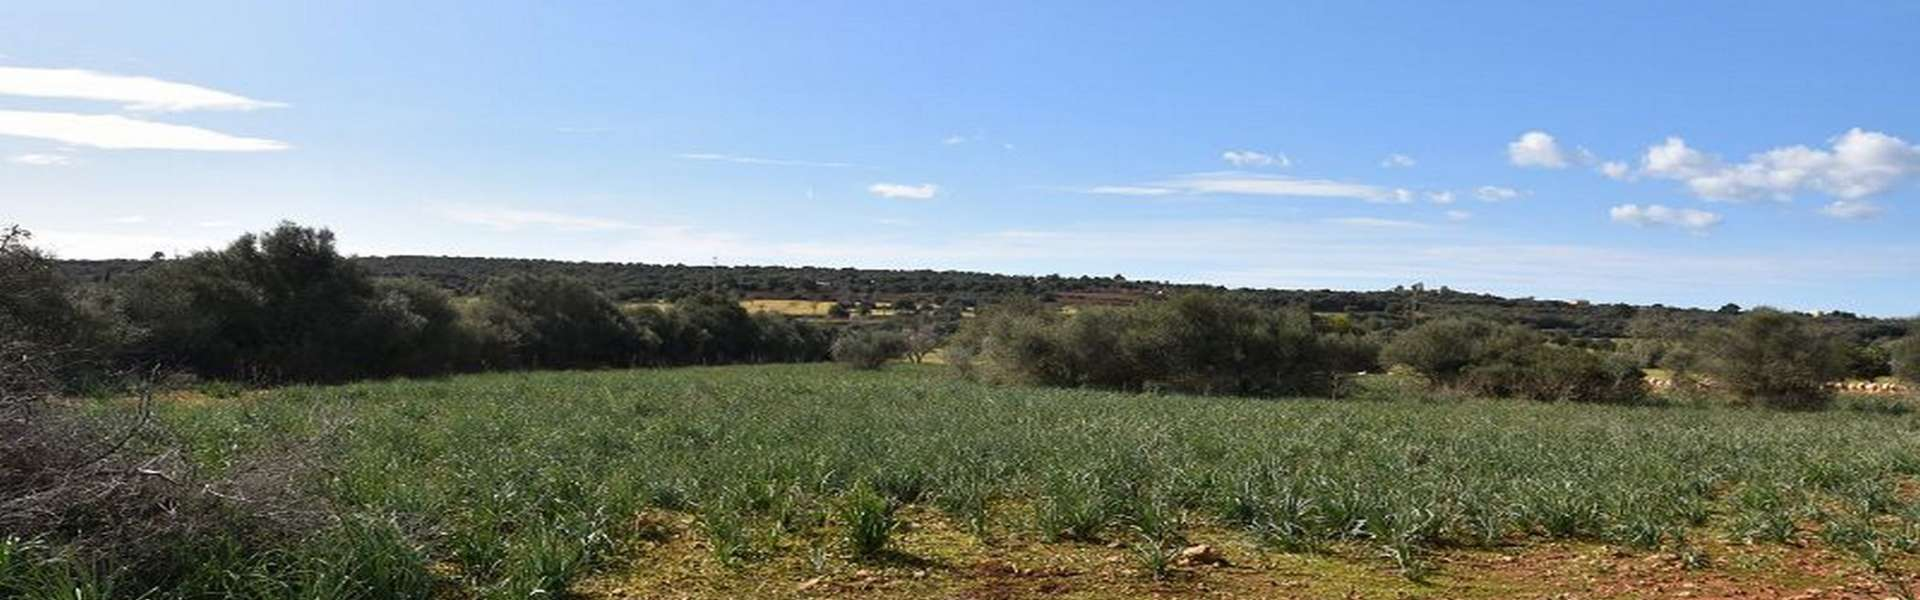 Campos - Finca ruin with idyllic spacious property